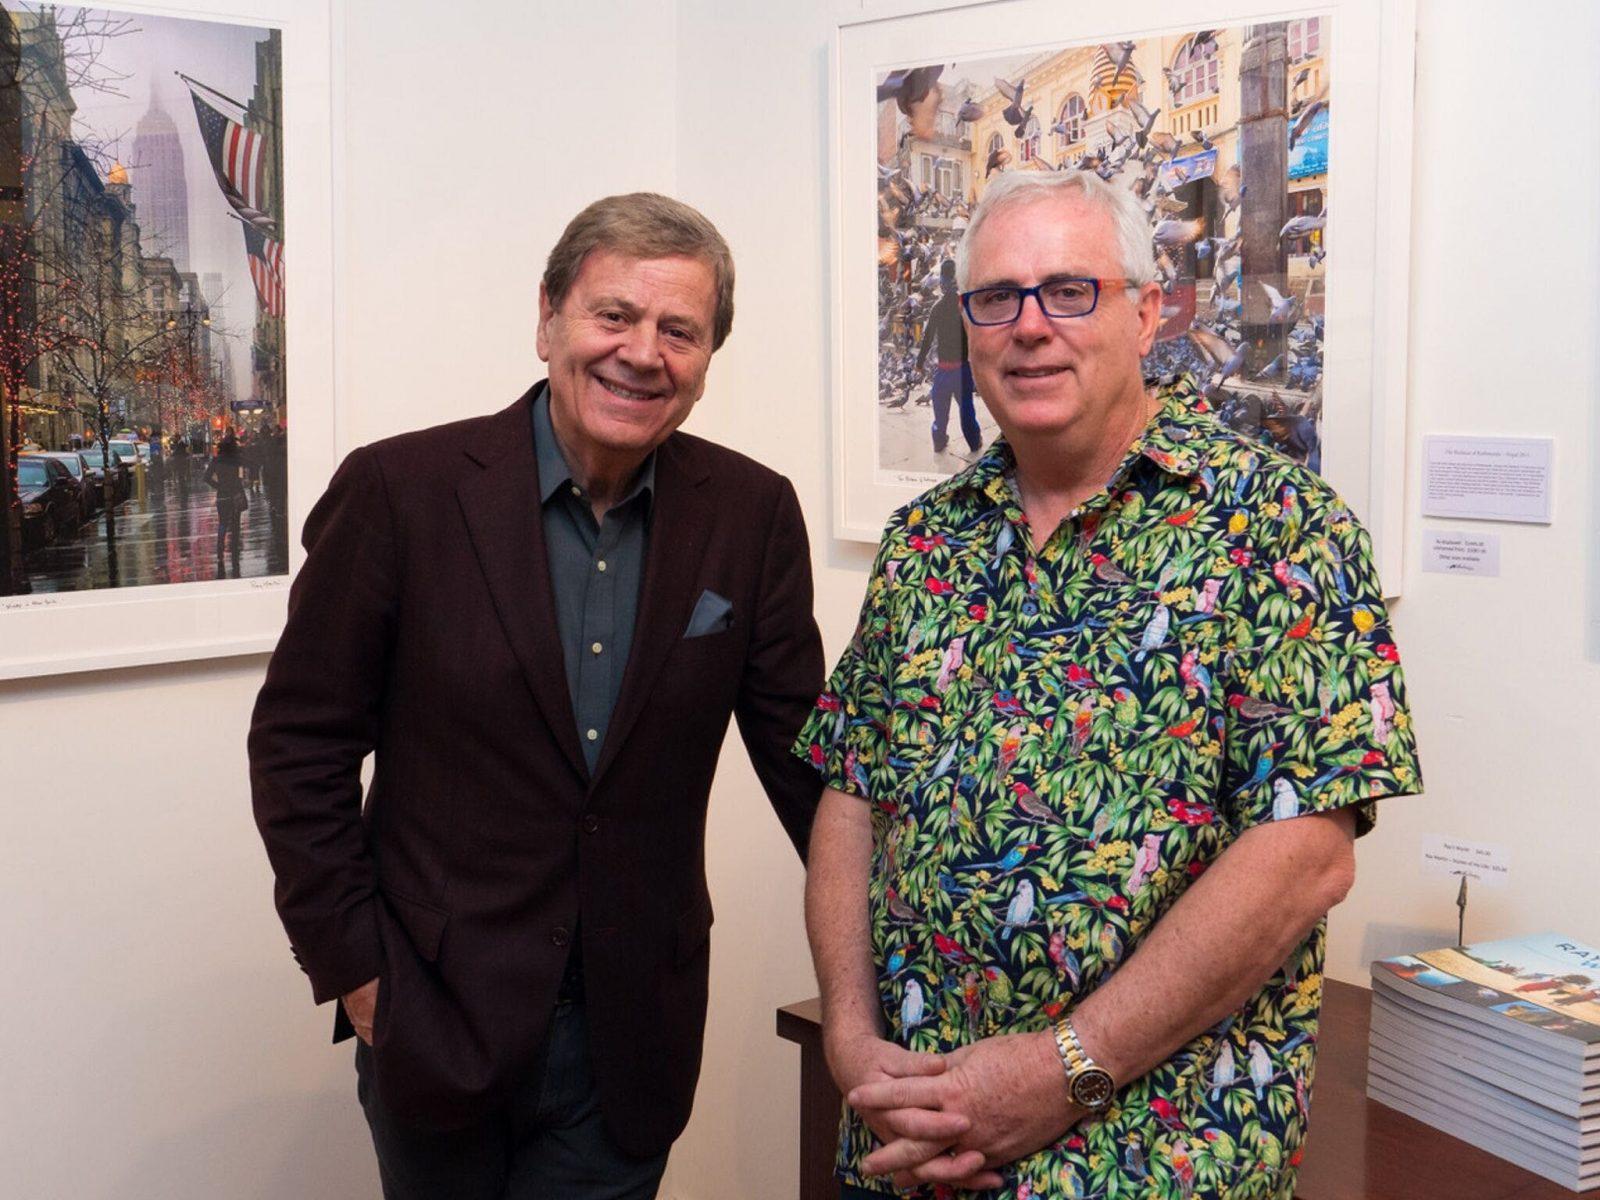 Ray MArtin & Ken Duncan